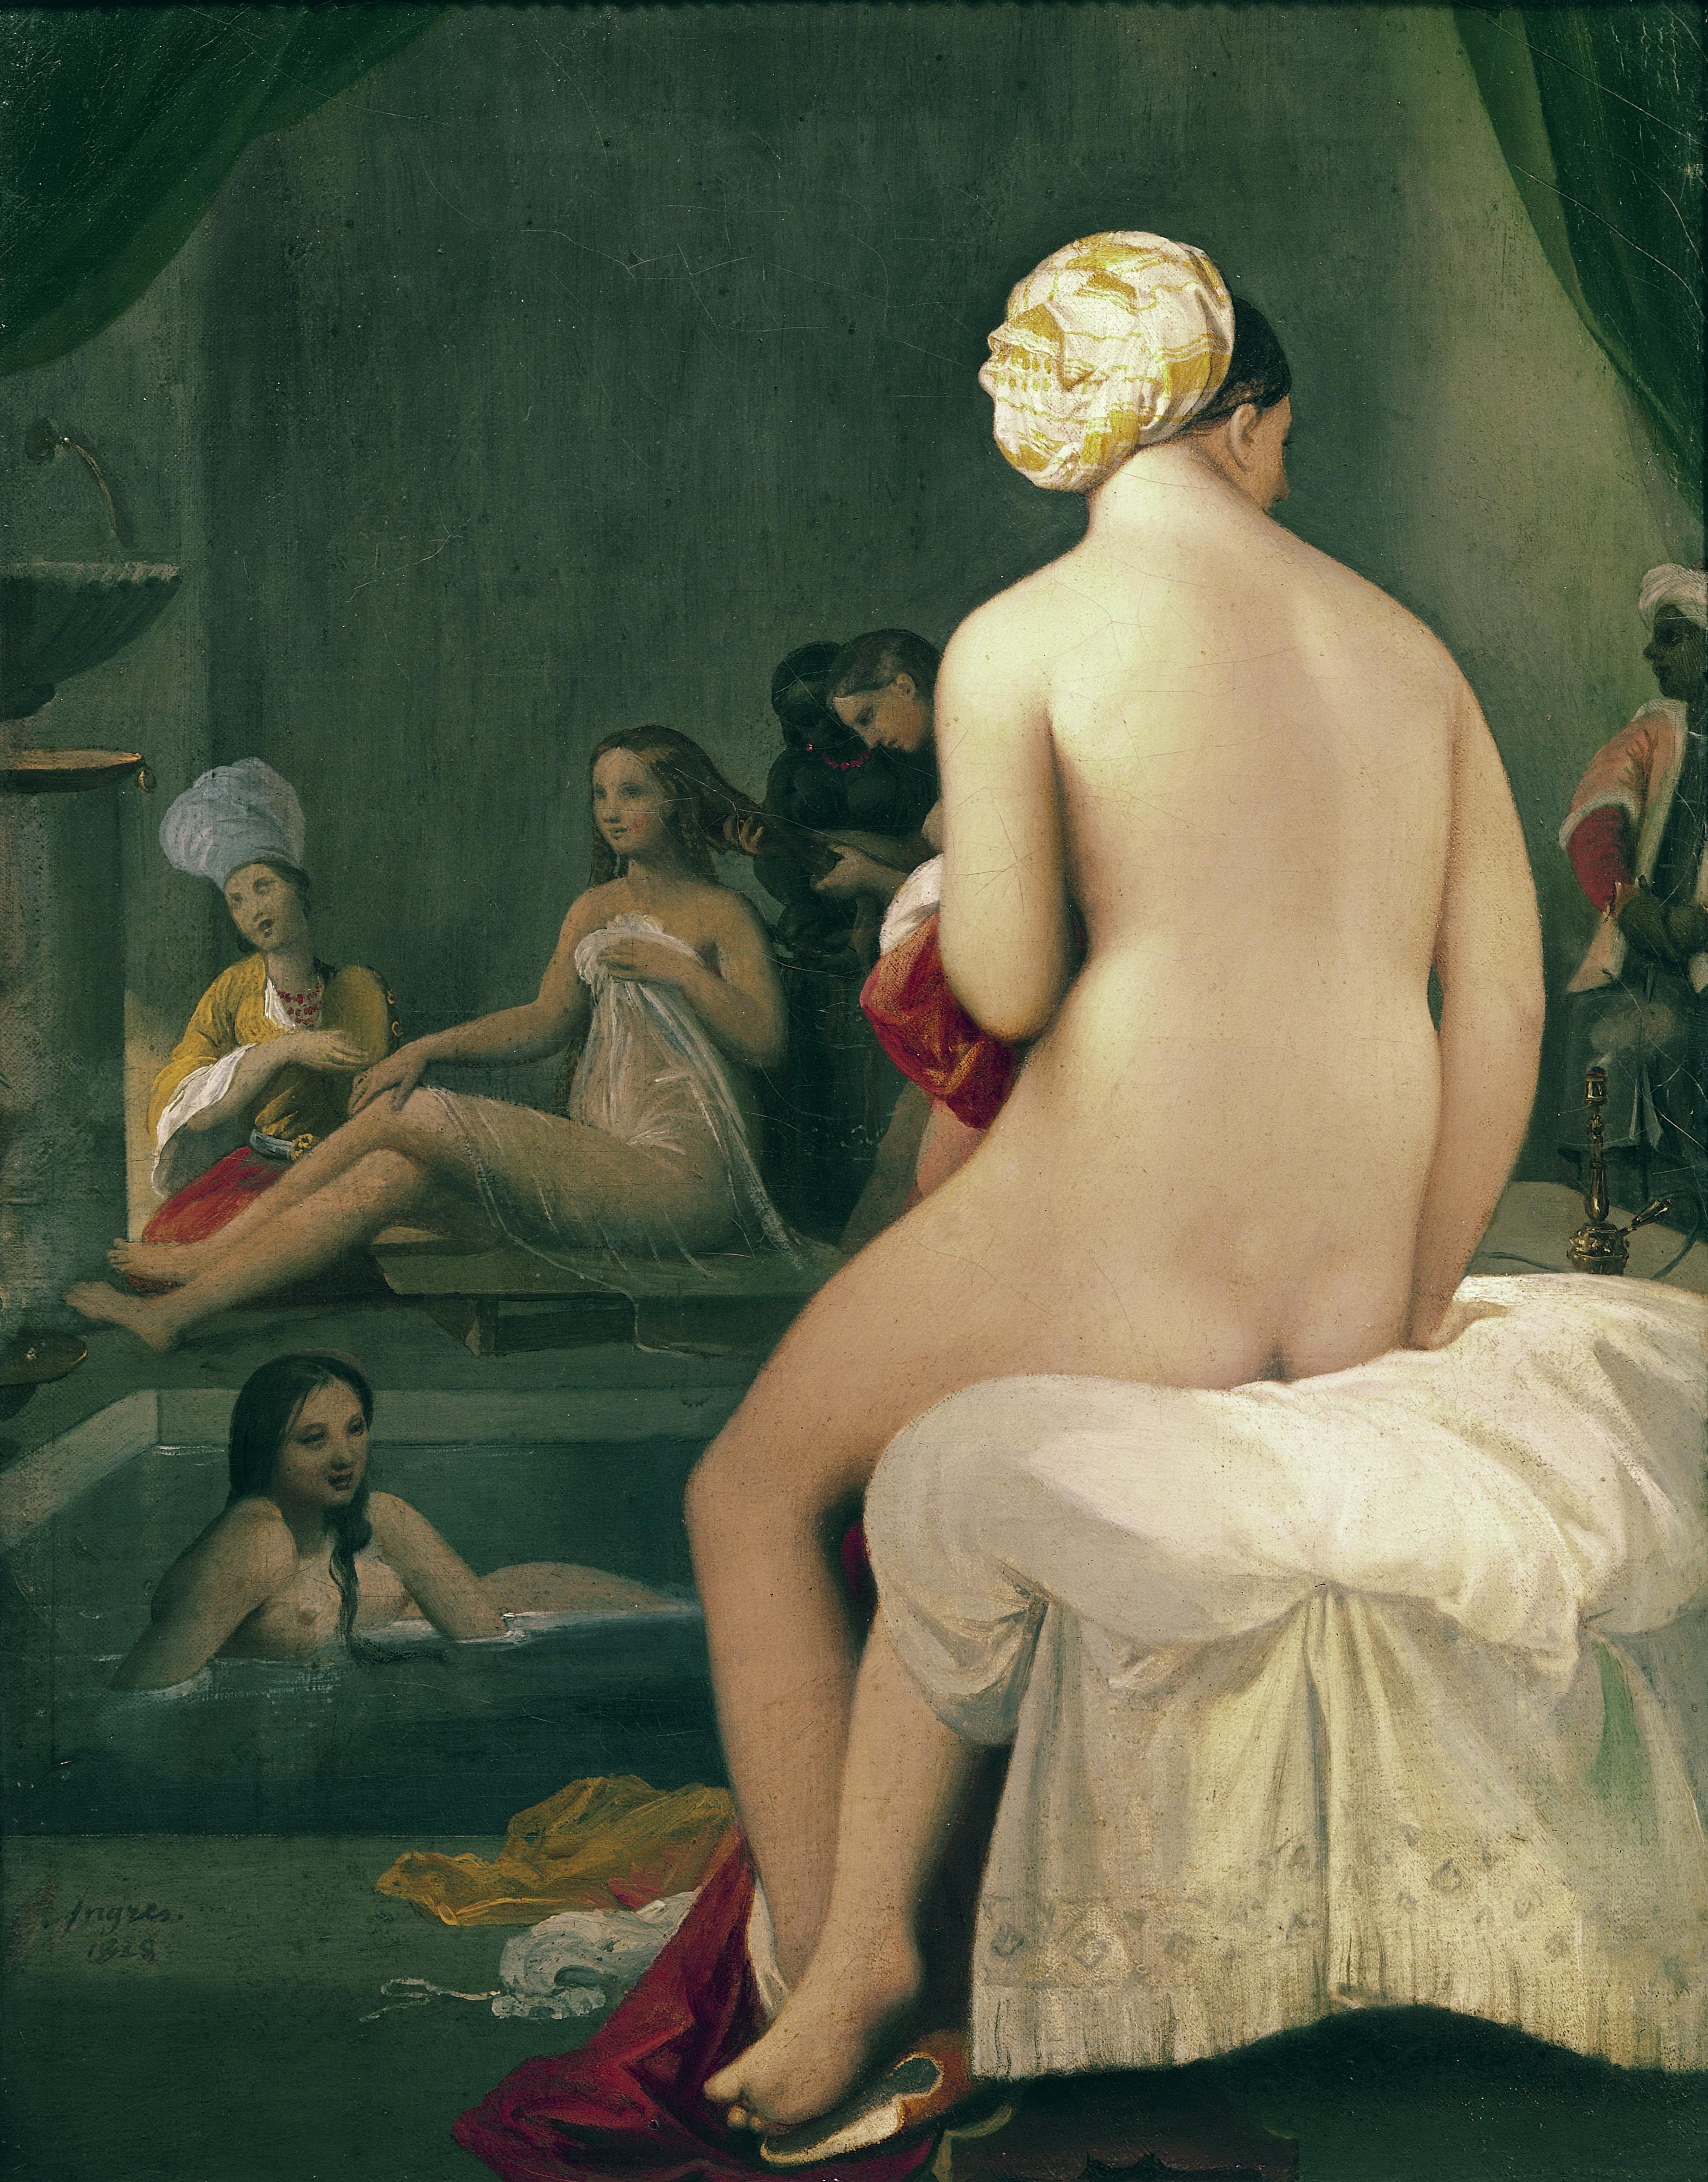 Jean Auguste Dominique Ingres, 1780-1867.  Купальщицы в гарем.  1828. 35 х 27 см. Париж, Лувр